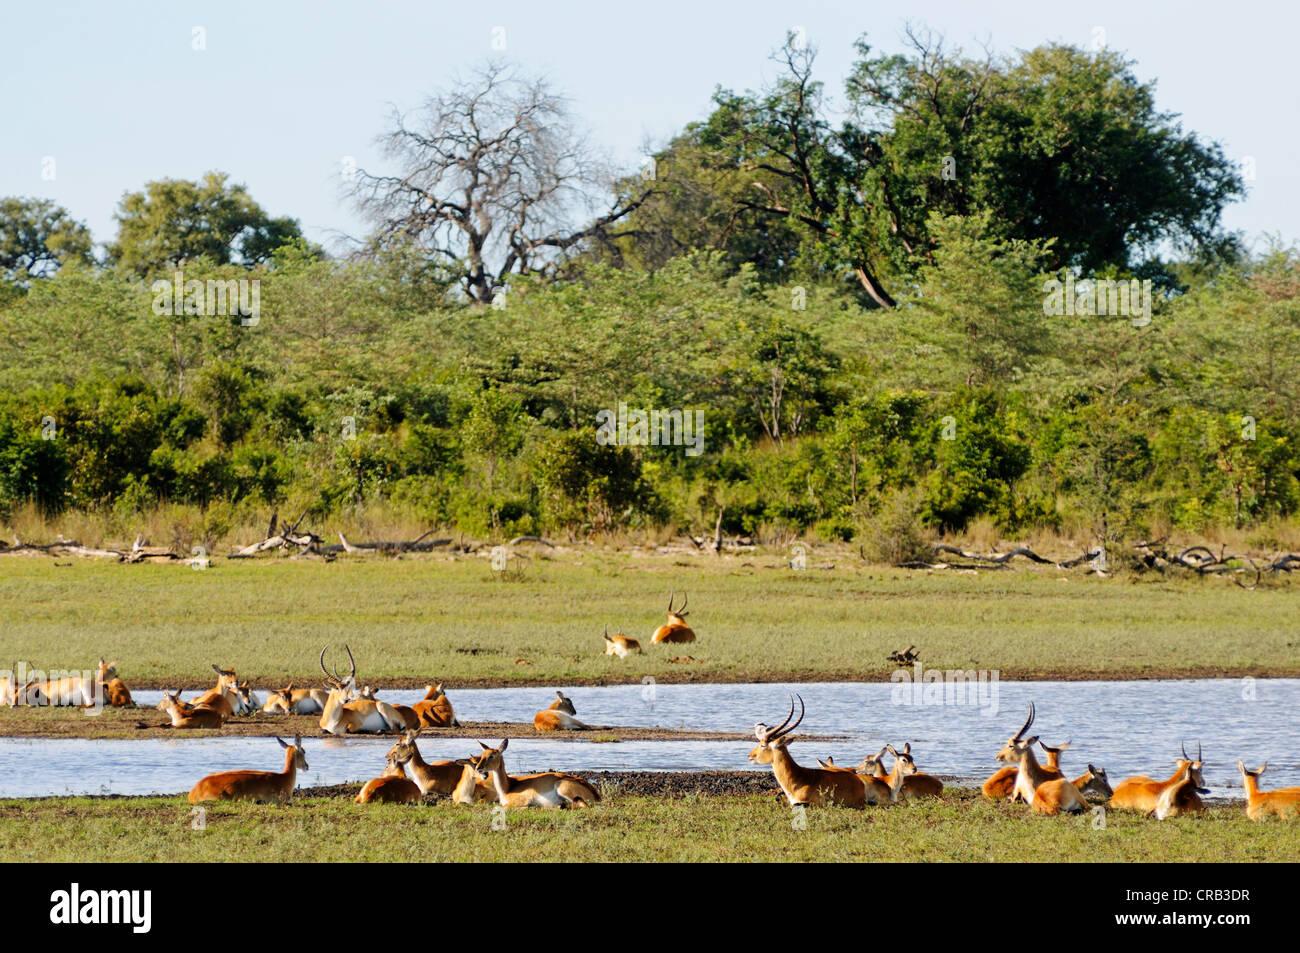 Southern Lechwe (Kobus leche) antelopes, in Bwabwata National Park, former Caprivi National Park and Mahango National - Stock Image